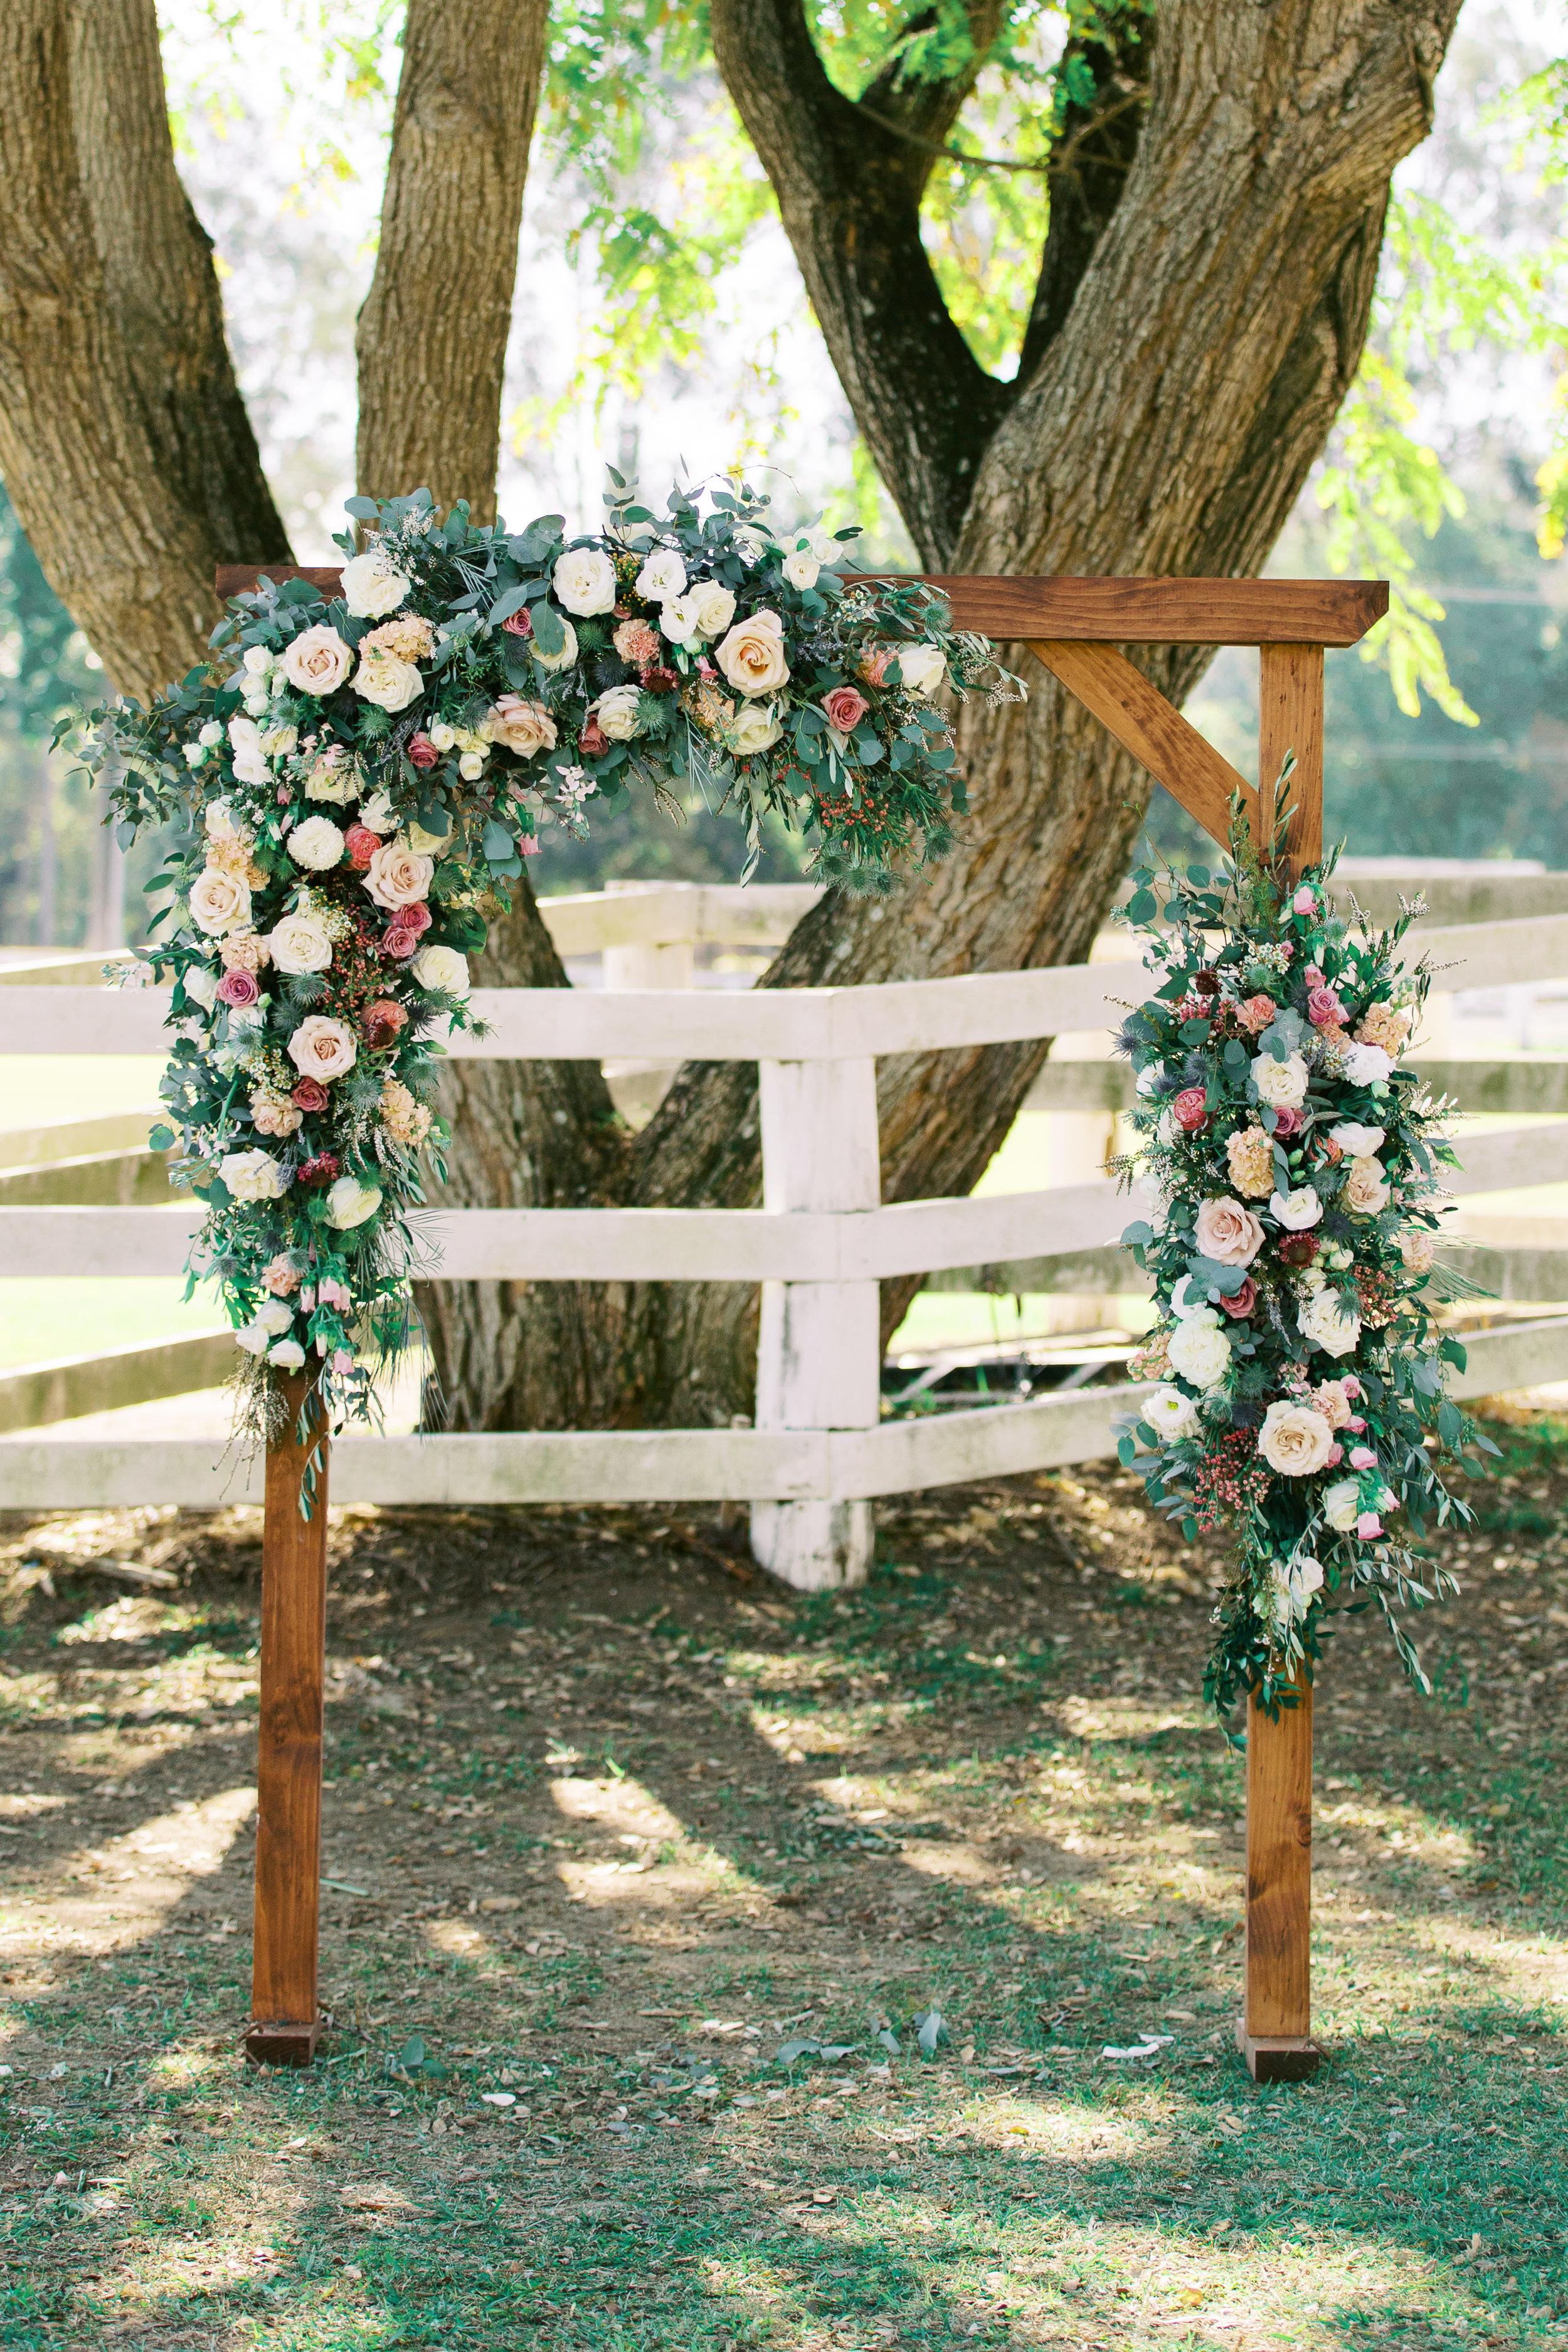 brisbane-gold-coast-sunshine-coast-tweed-romantic-fine-art-wedding-photography-lauren-olivia-21.jpg